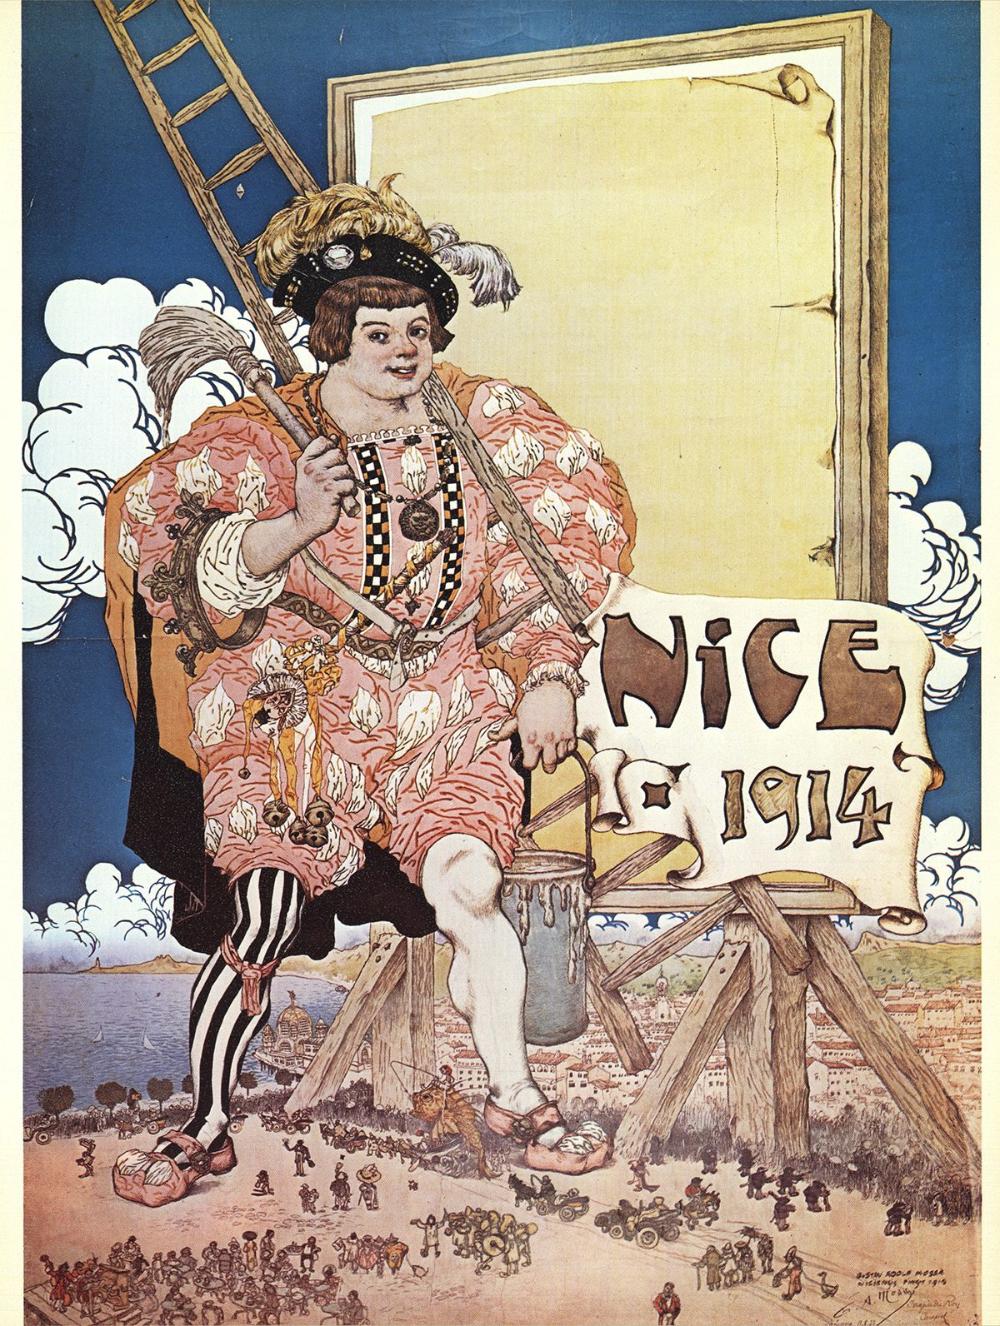 Portrait of Orleans 1950 by Edward Hopper Art Print Poster 26x36